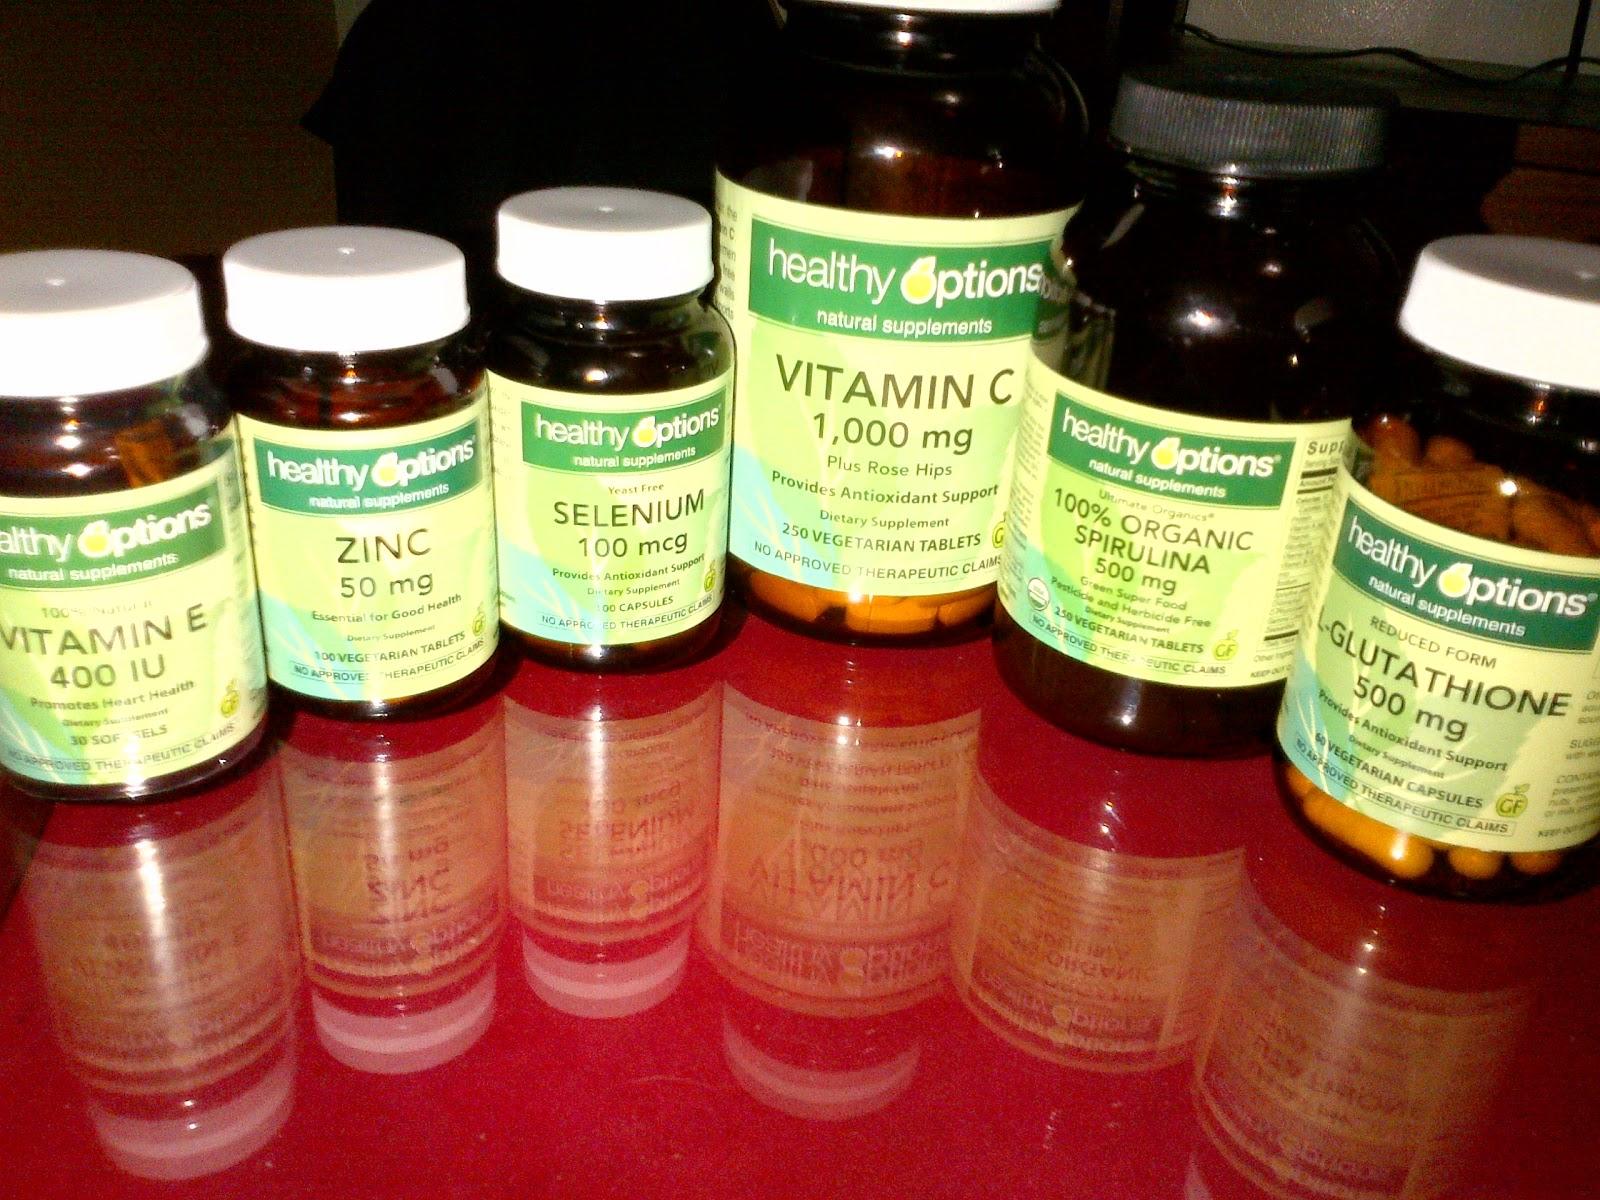 Femara mg.doc - October 23 2012